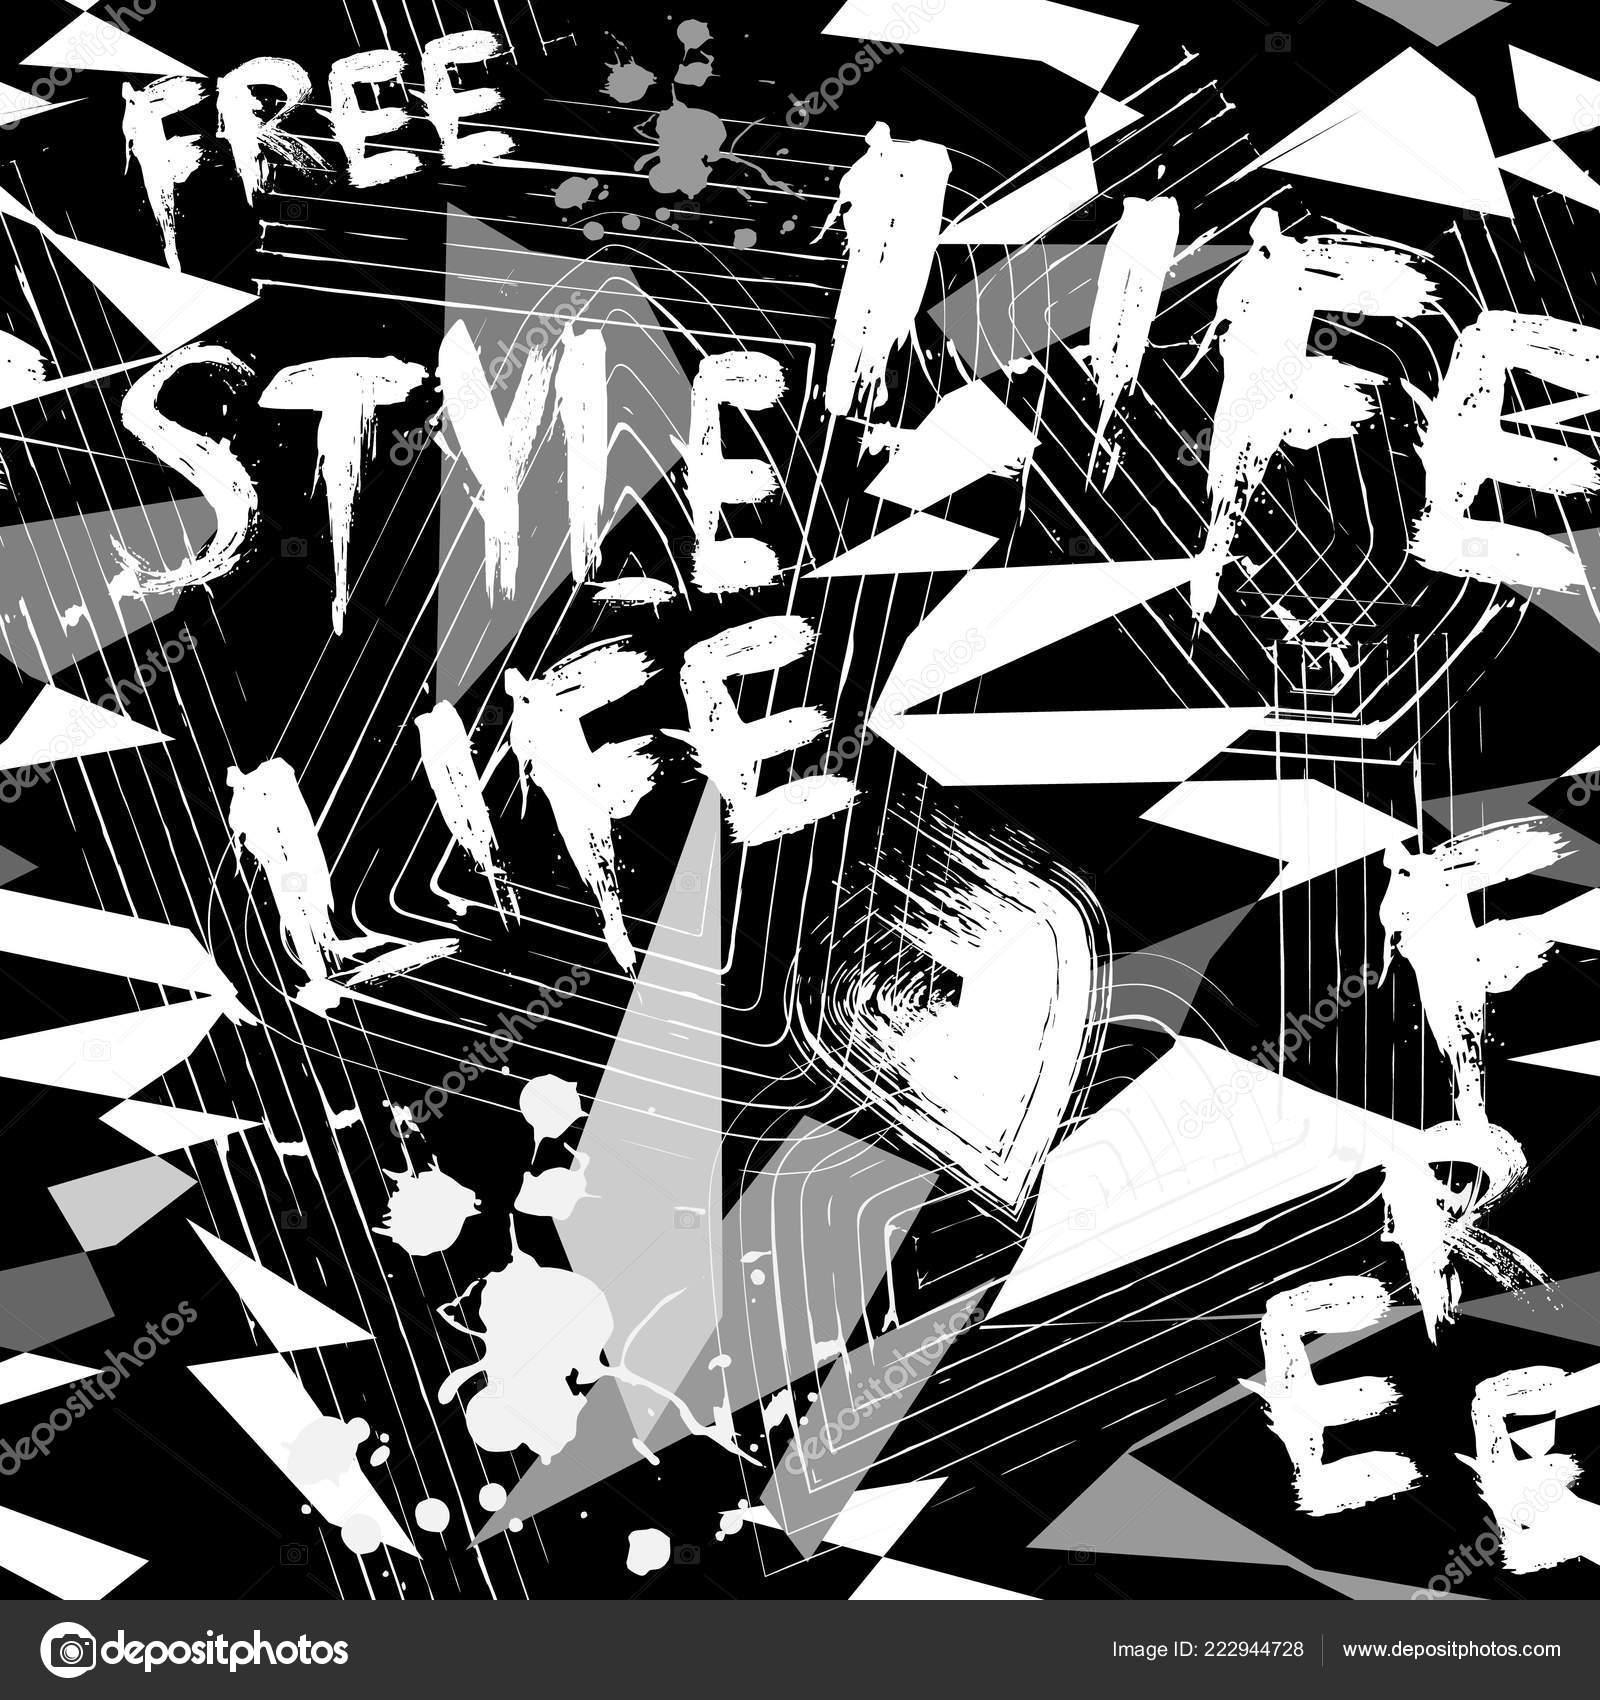 Grunge Geometric Vector Black White Abstract Seamless